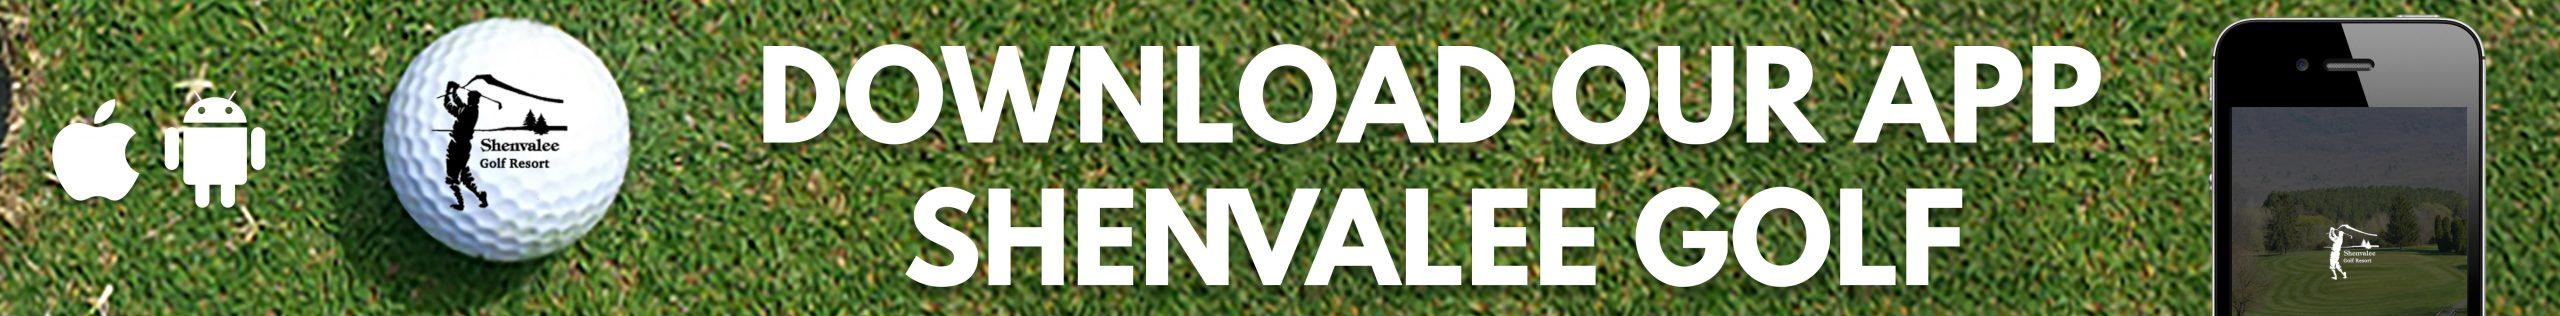 Shenvalee App Web Banner